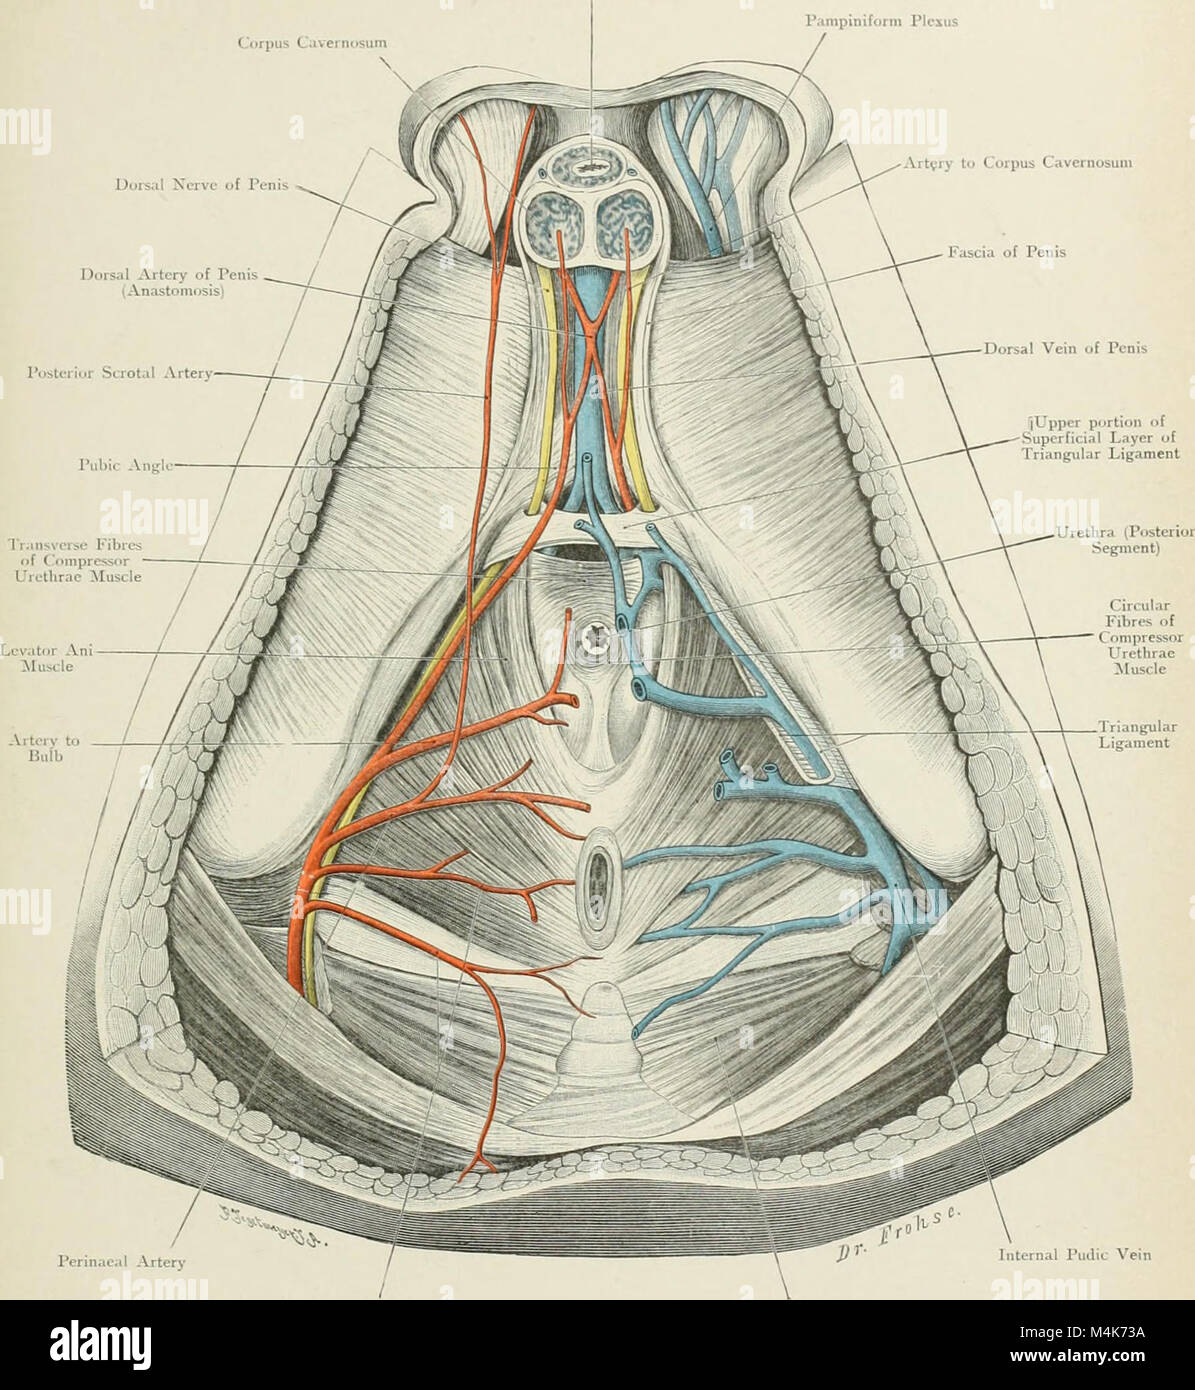 Atlas Of Topographical Anatomy Stock Photos Atlas Of Topographical